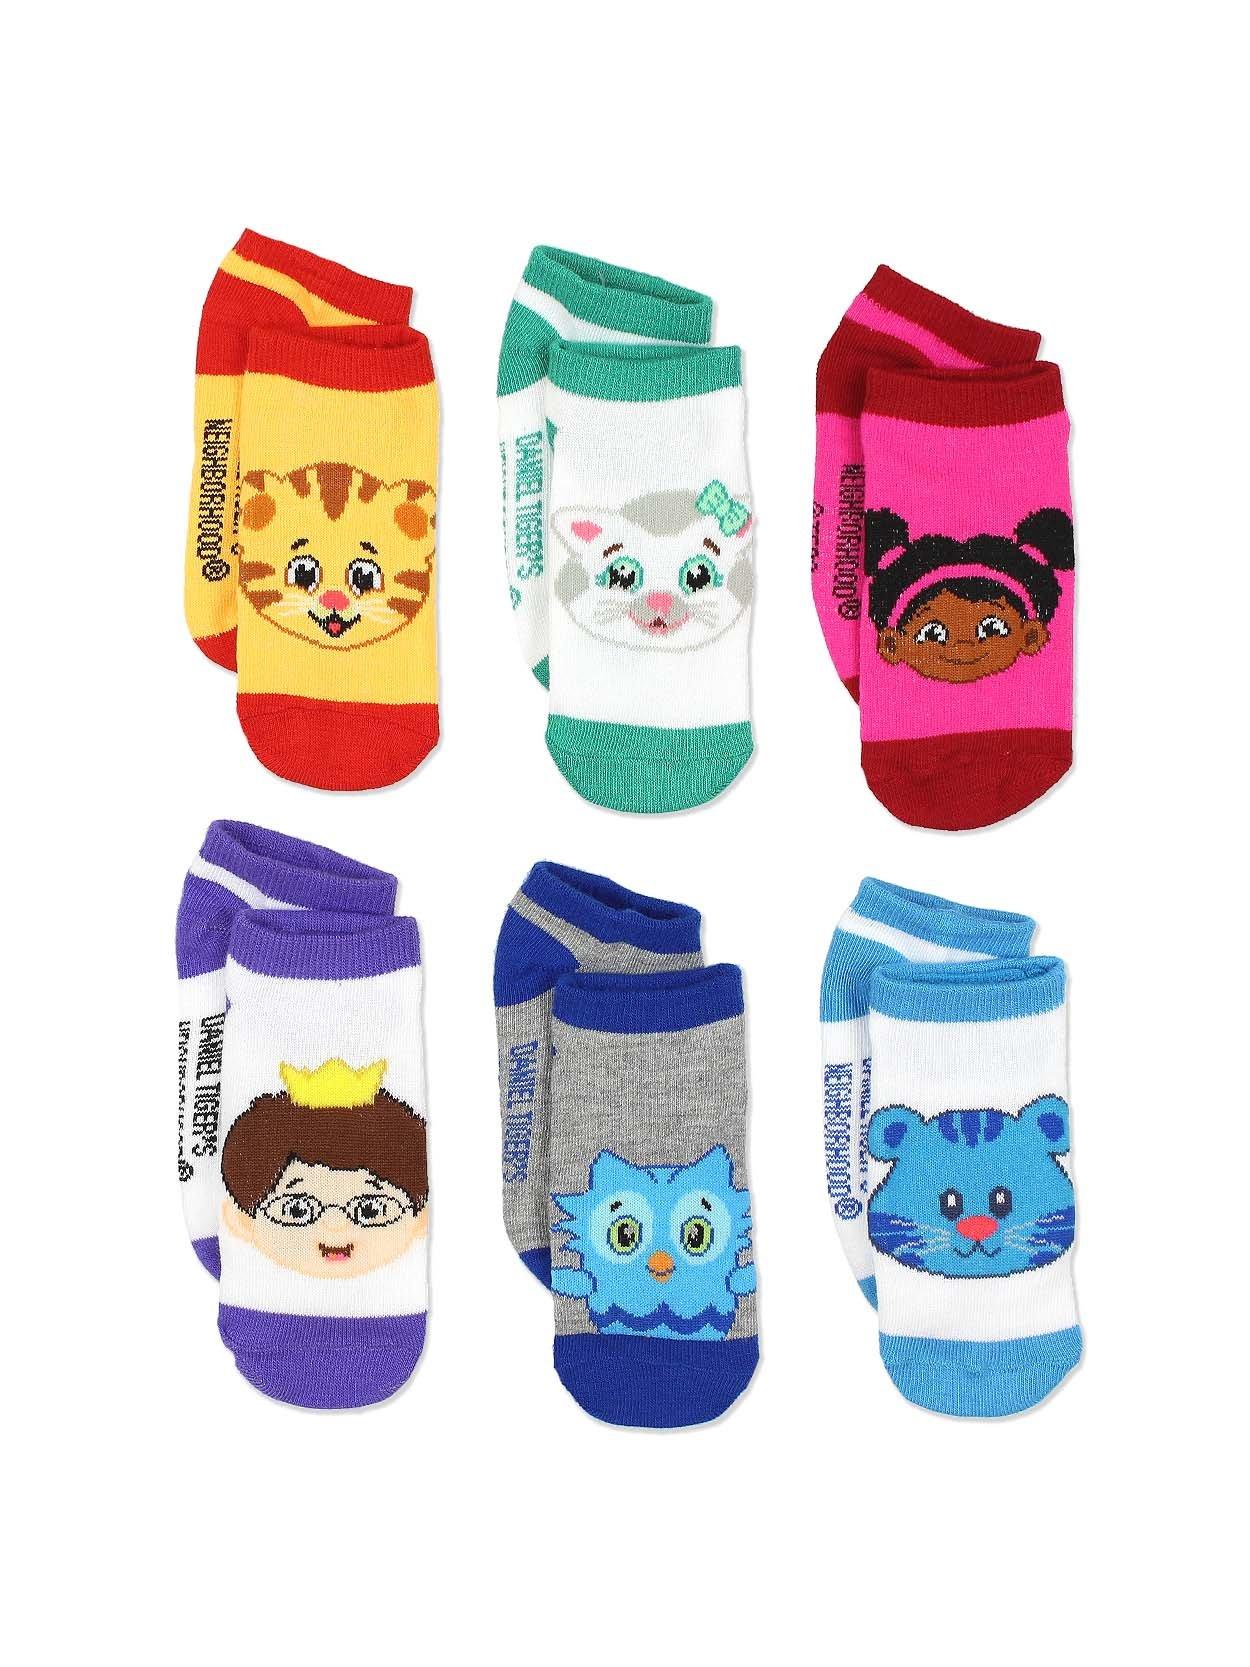 Daniel Tiger's Neighborhood Boys Girls 6 pack Socks (4-6 Toddler (Shoe: 7-10), Orange/Multi)